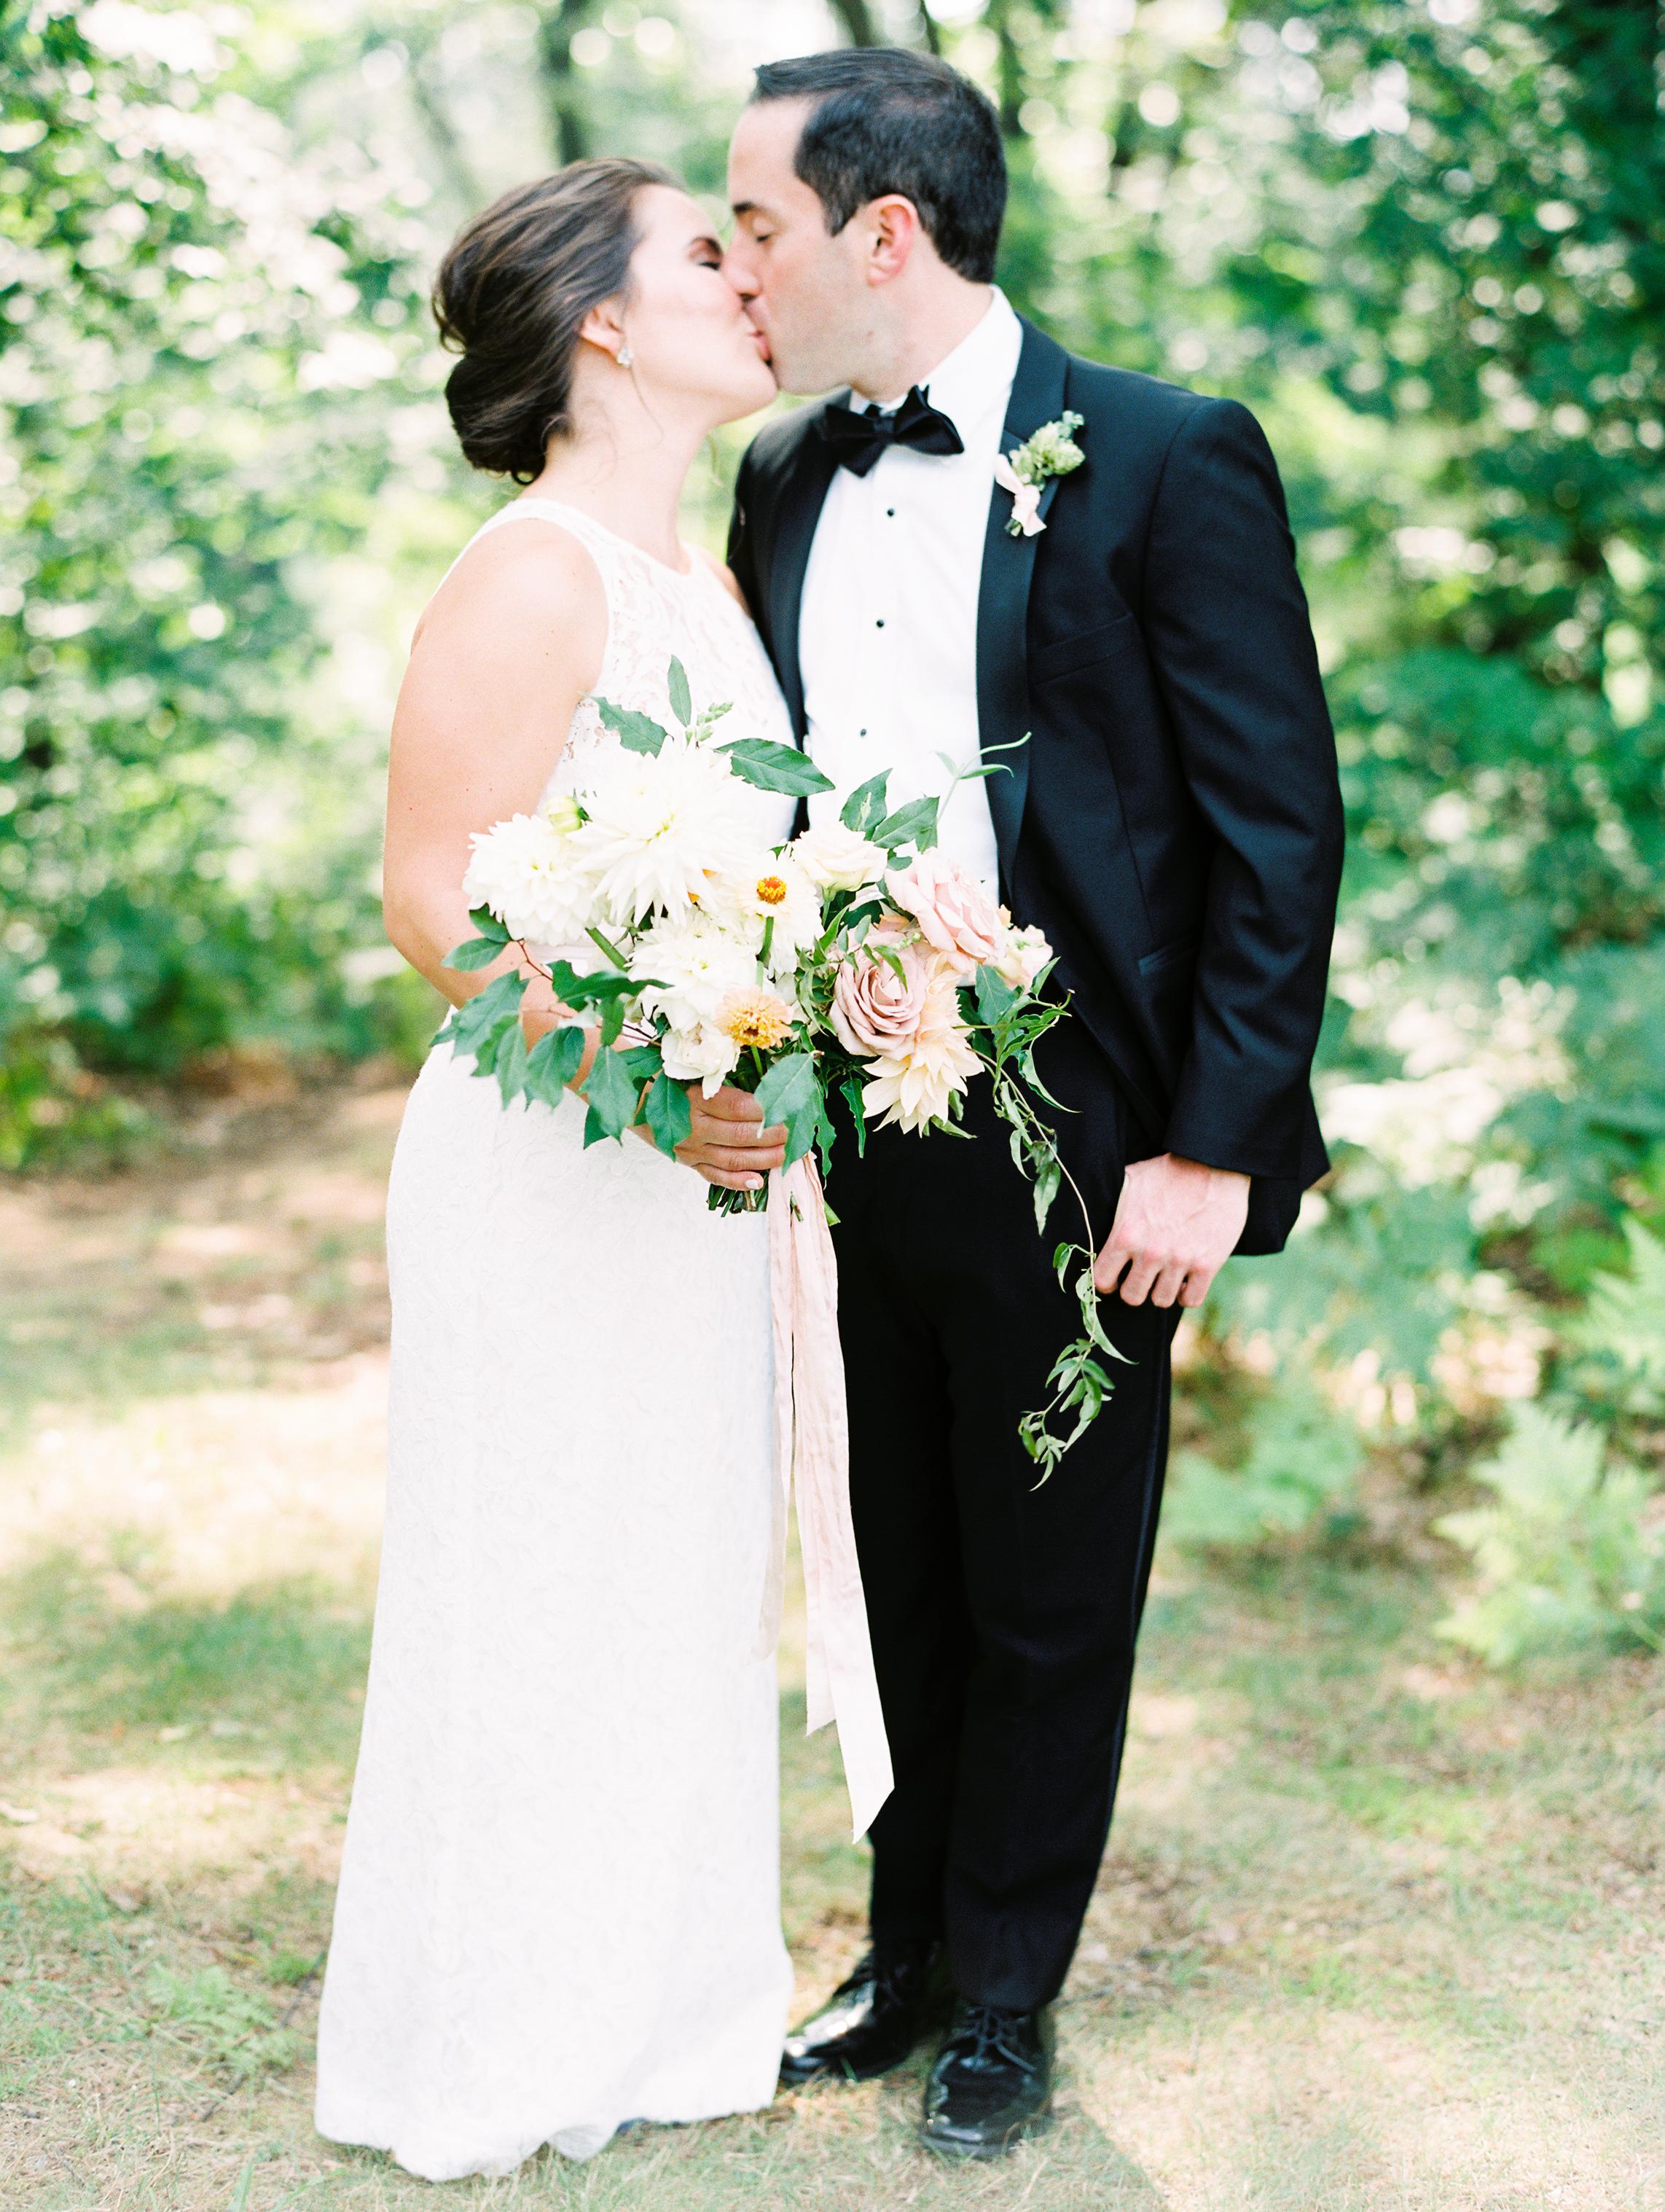 Zoller+Wedding+Bridal+Partyf-44.jpg